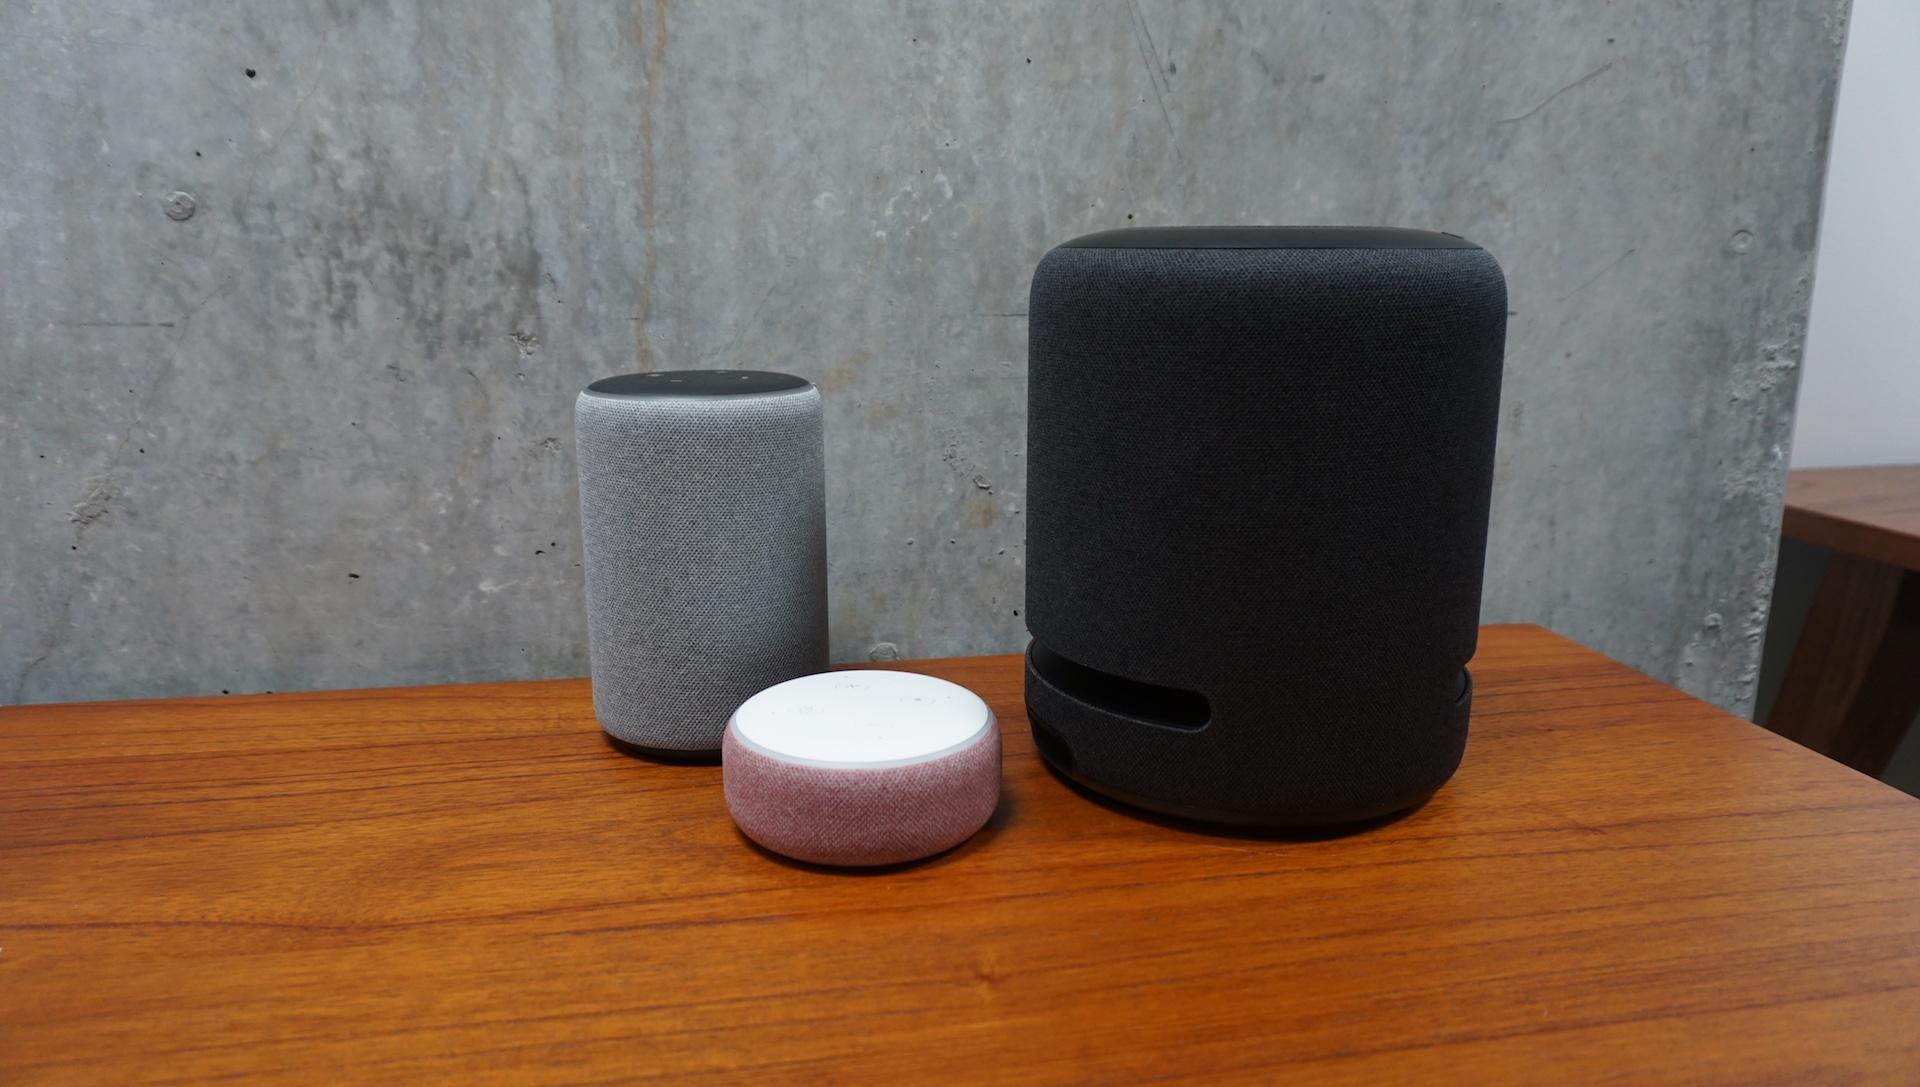 Amazon Echo Studio. Image Credit: TechRadar